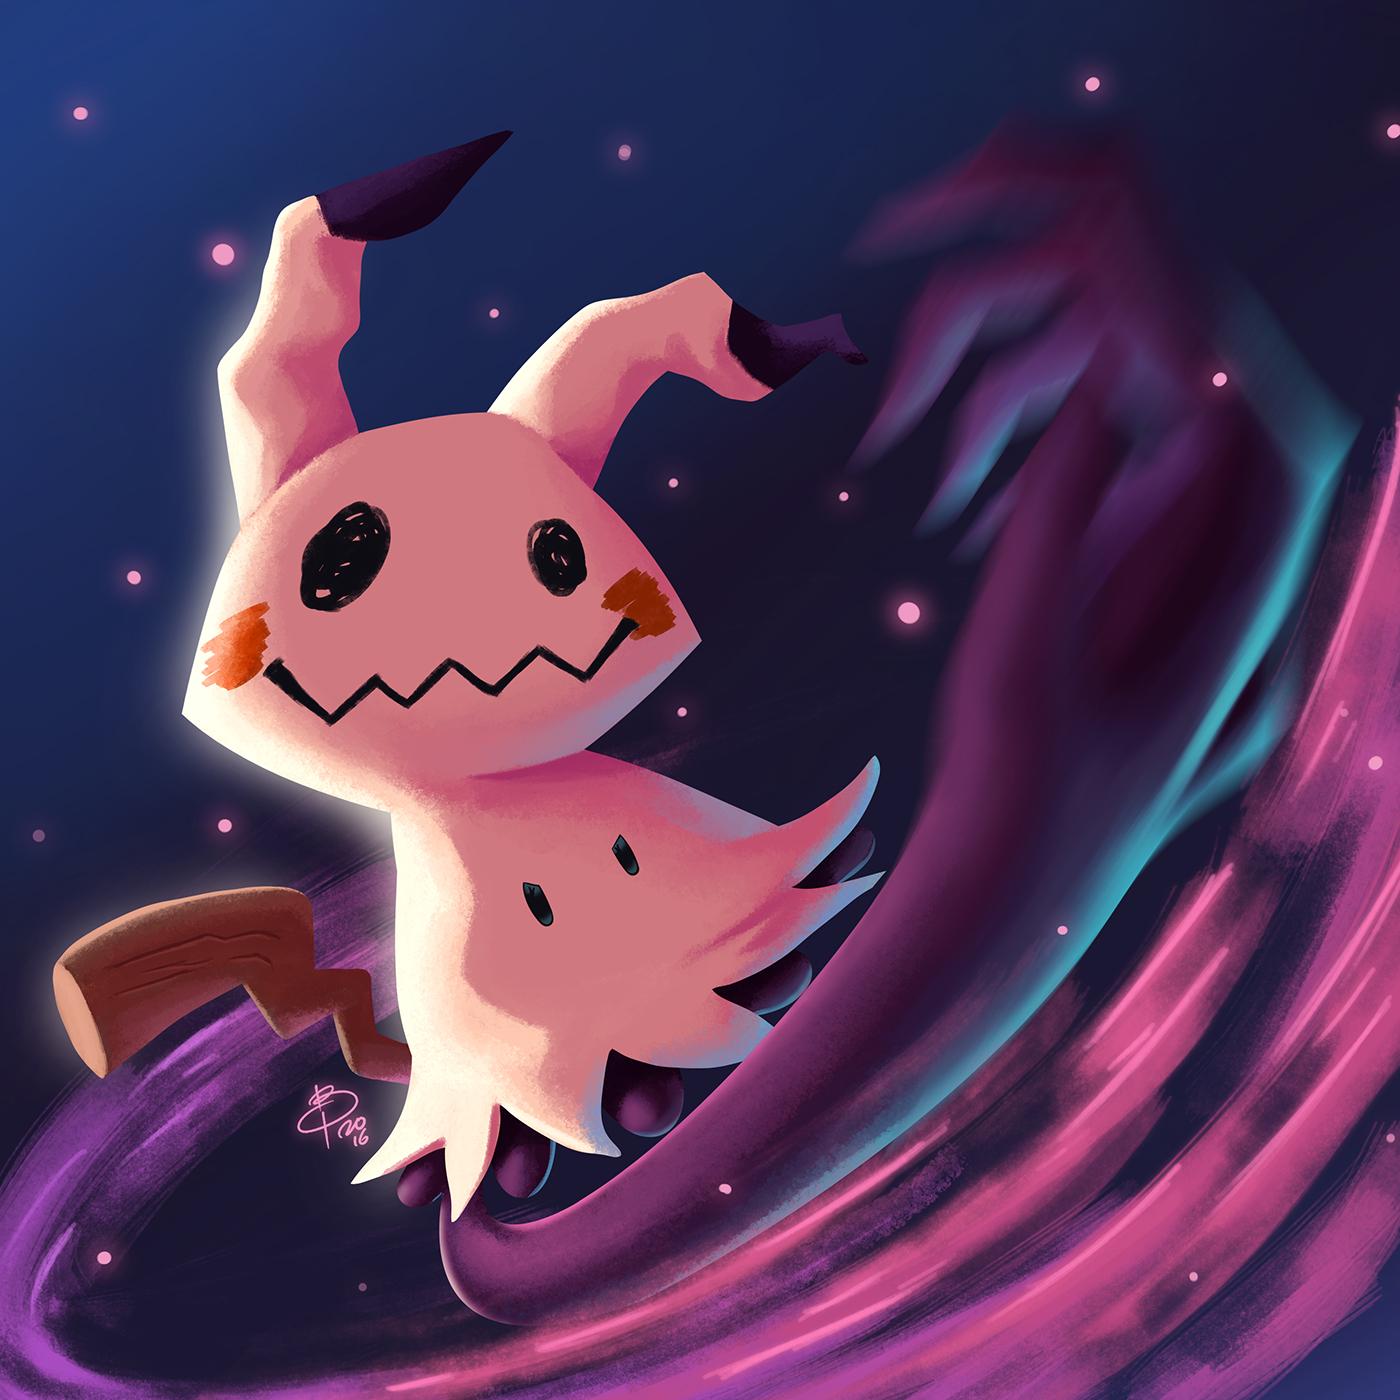 Cute Raichu Wallpaper Alola S Pokemon On Behance